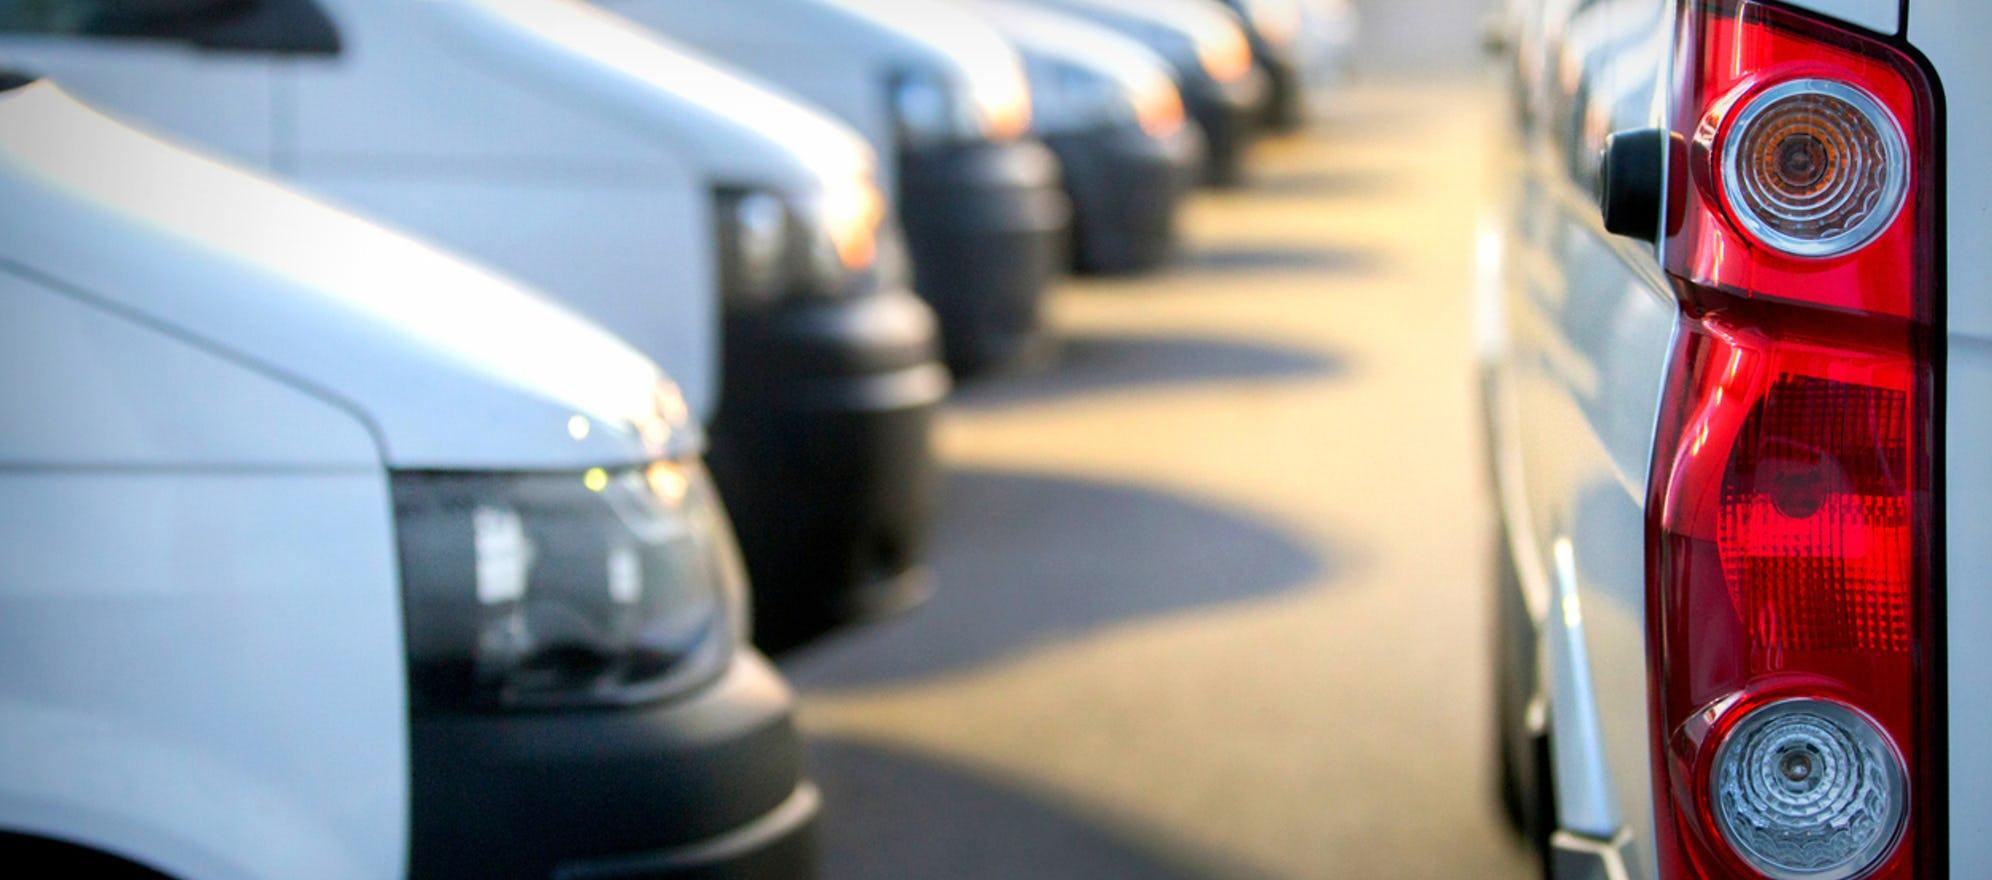 fleet_cars_vans-1501023477051.jpg